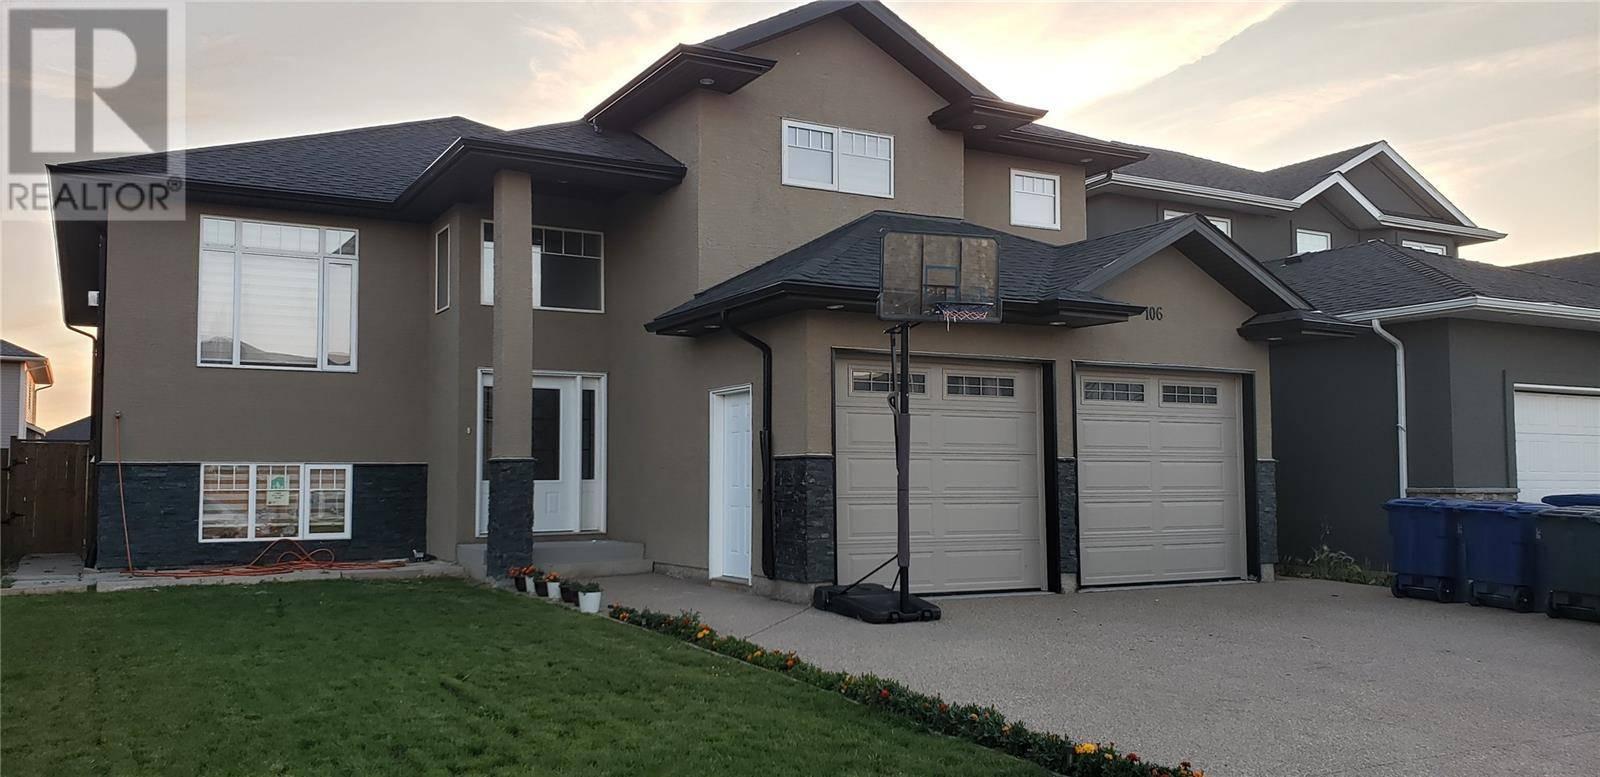 House for sale at 106 Kloppenburg Cres Saskatoon Saskatchewan - MLS: SK779725